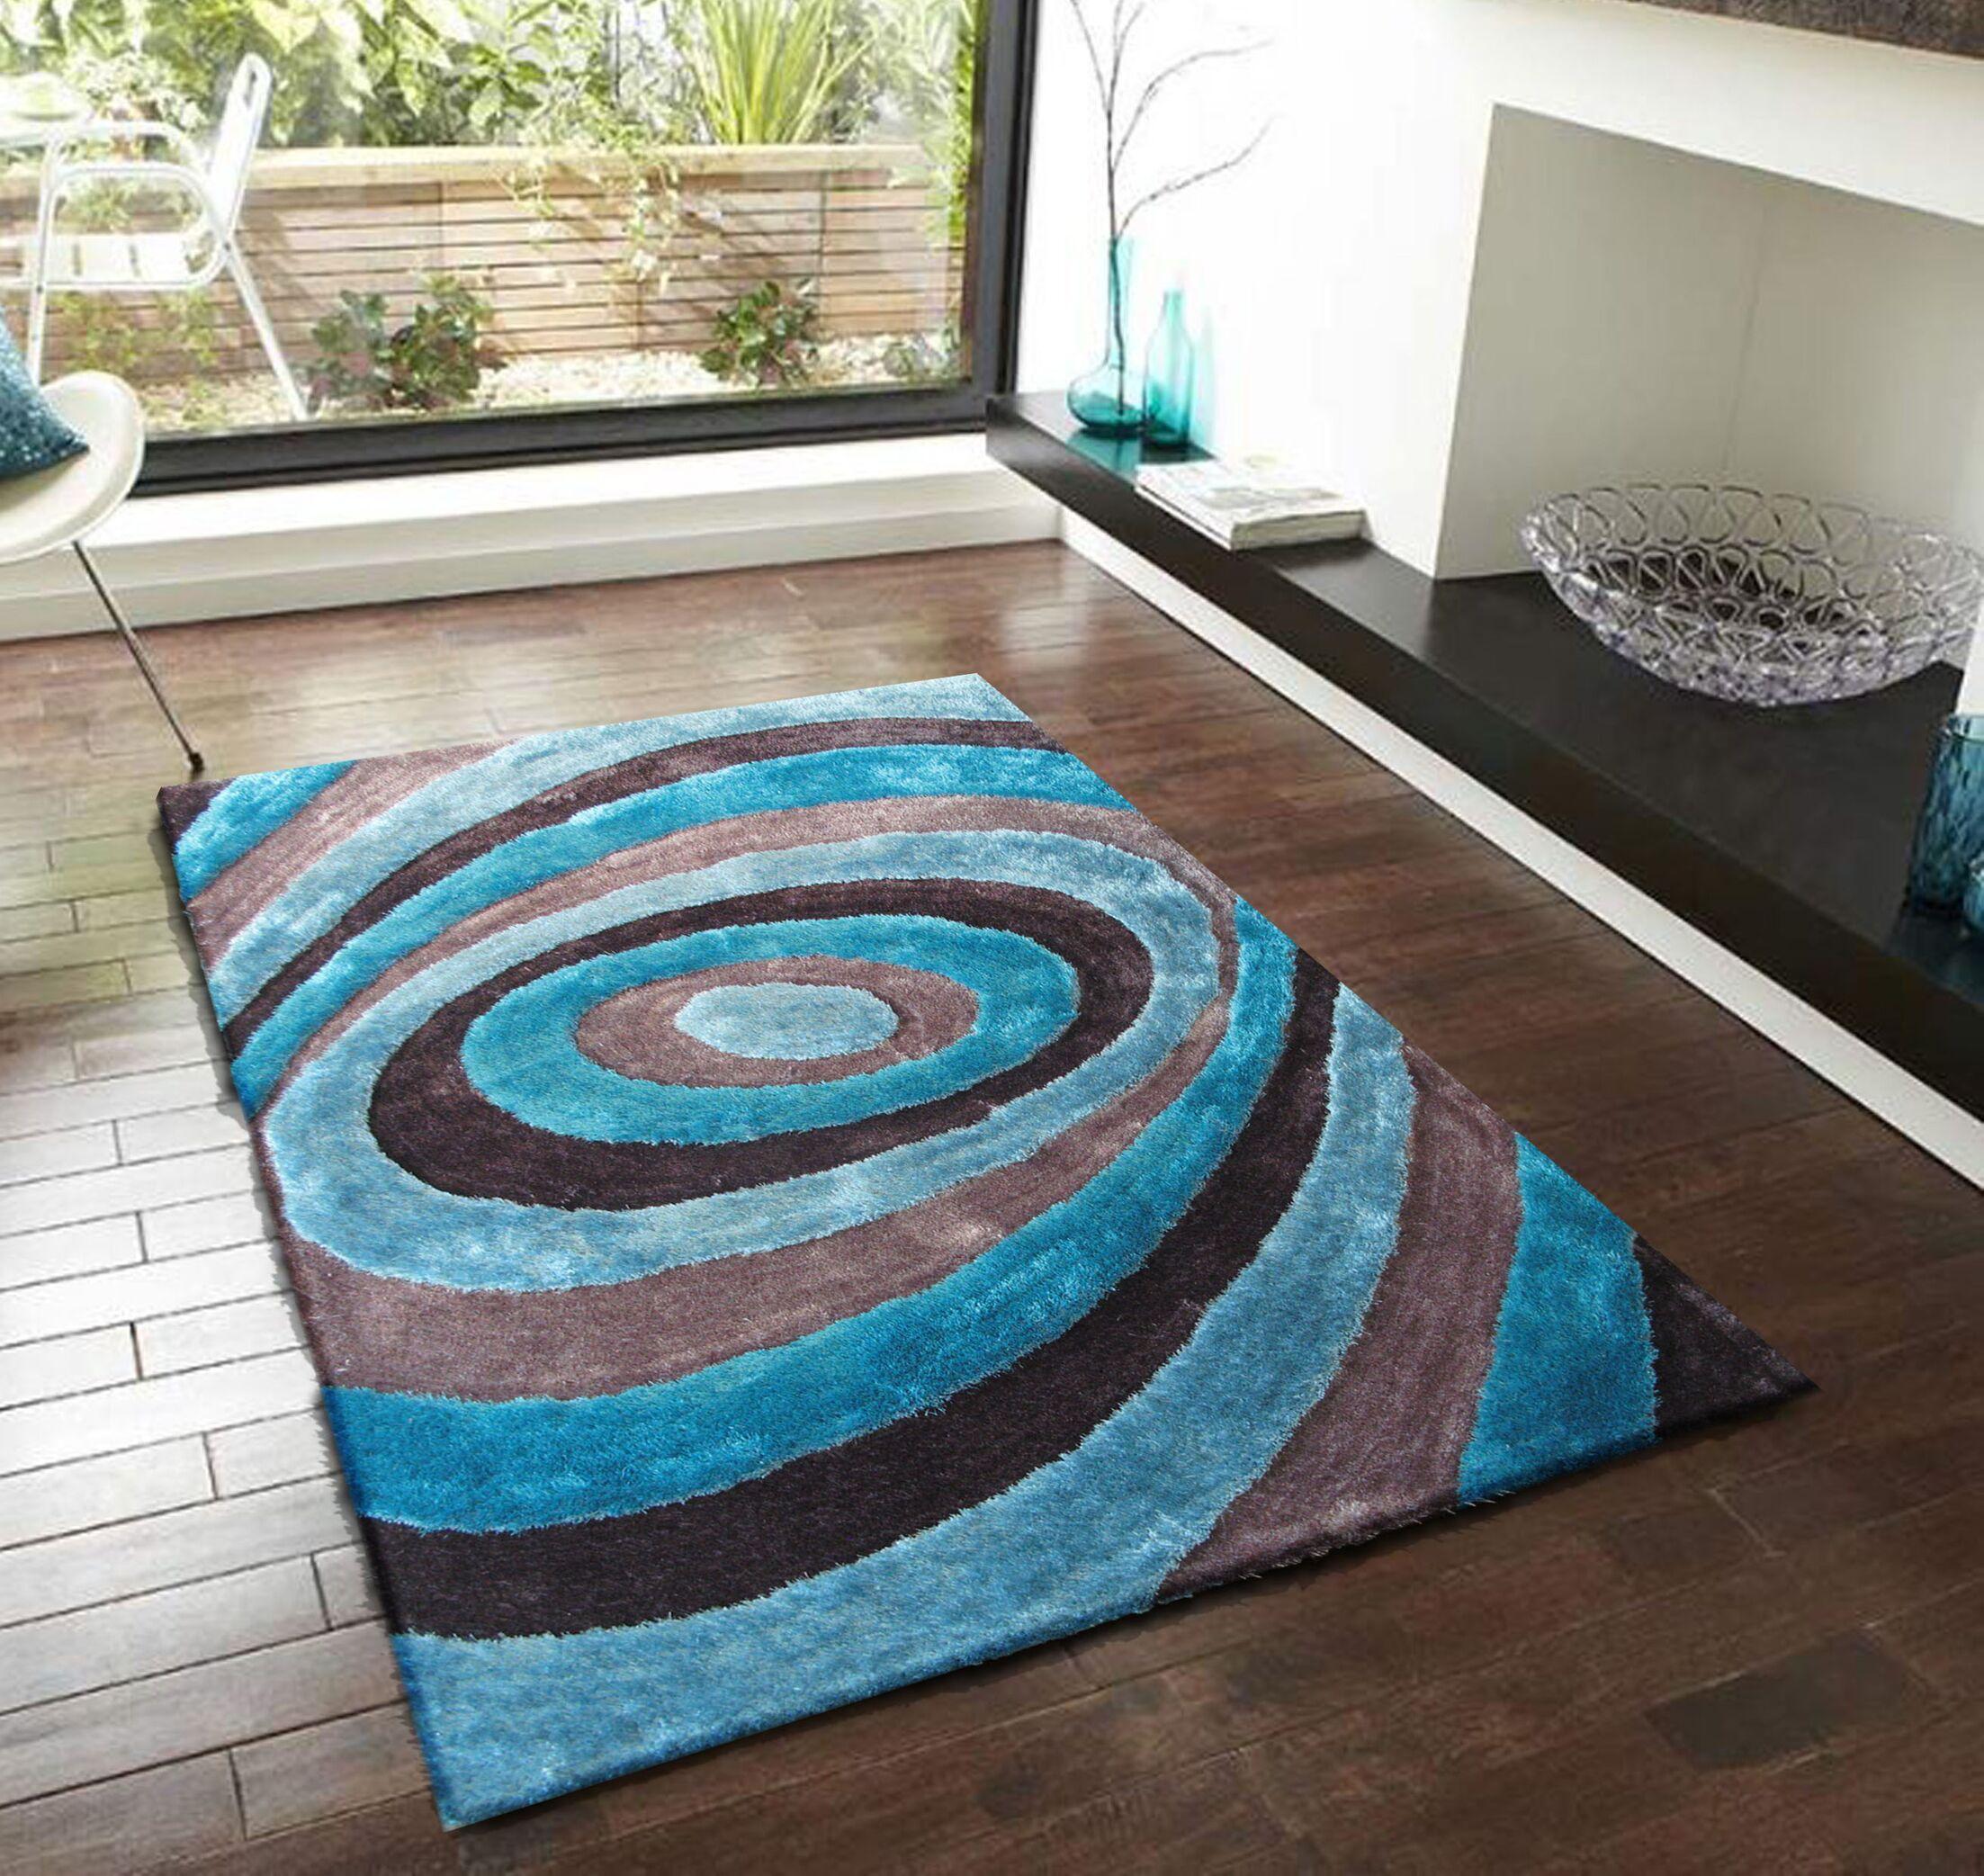 Orme Shaggy Hand-Tufted Gray/Blue Area Rug Rug Size: Rectangle 4' x 5'4